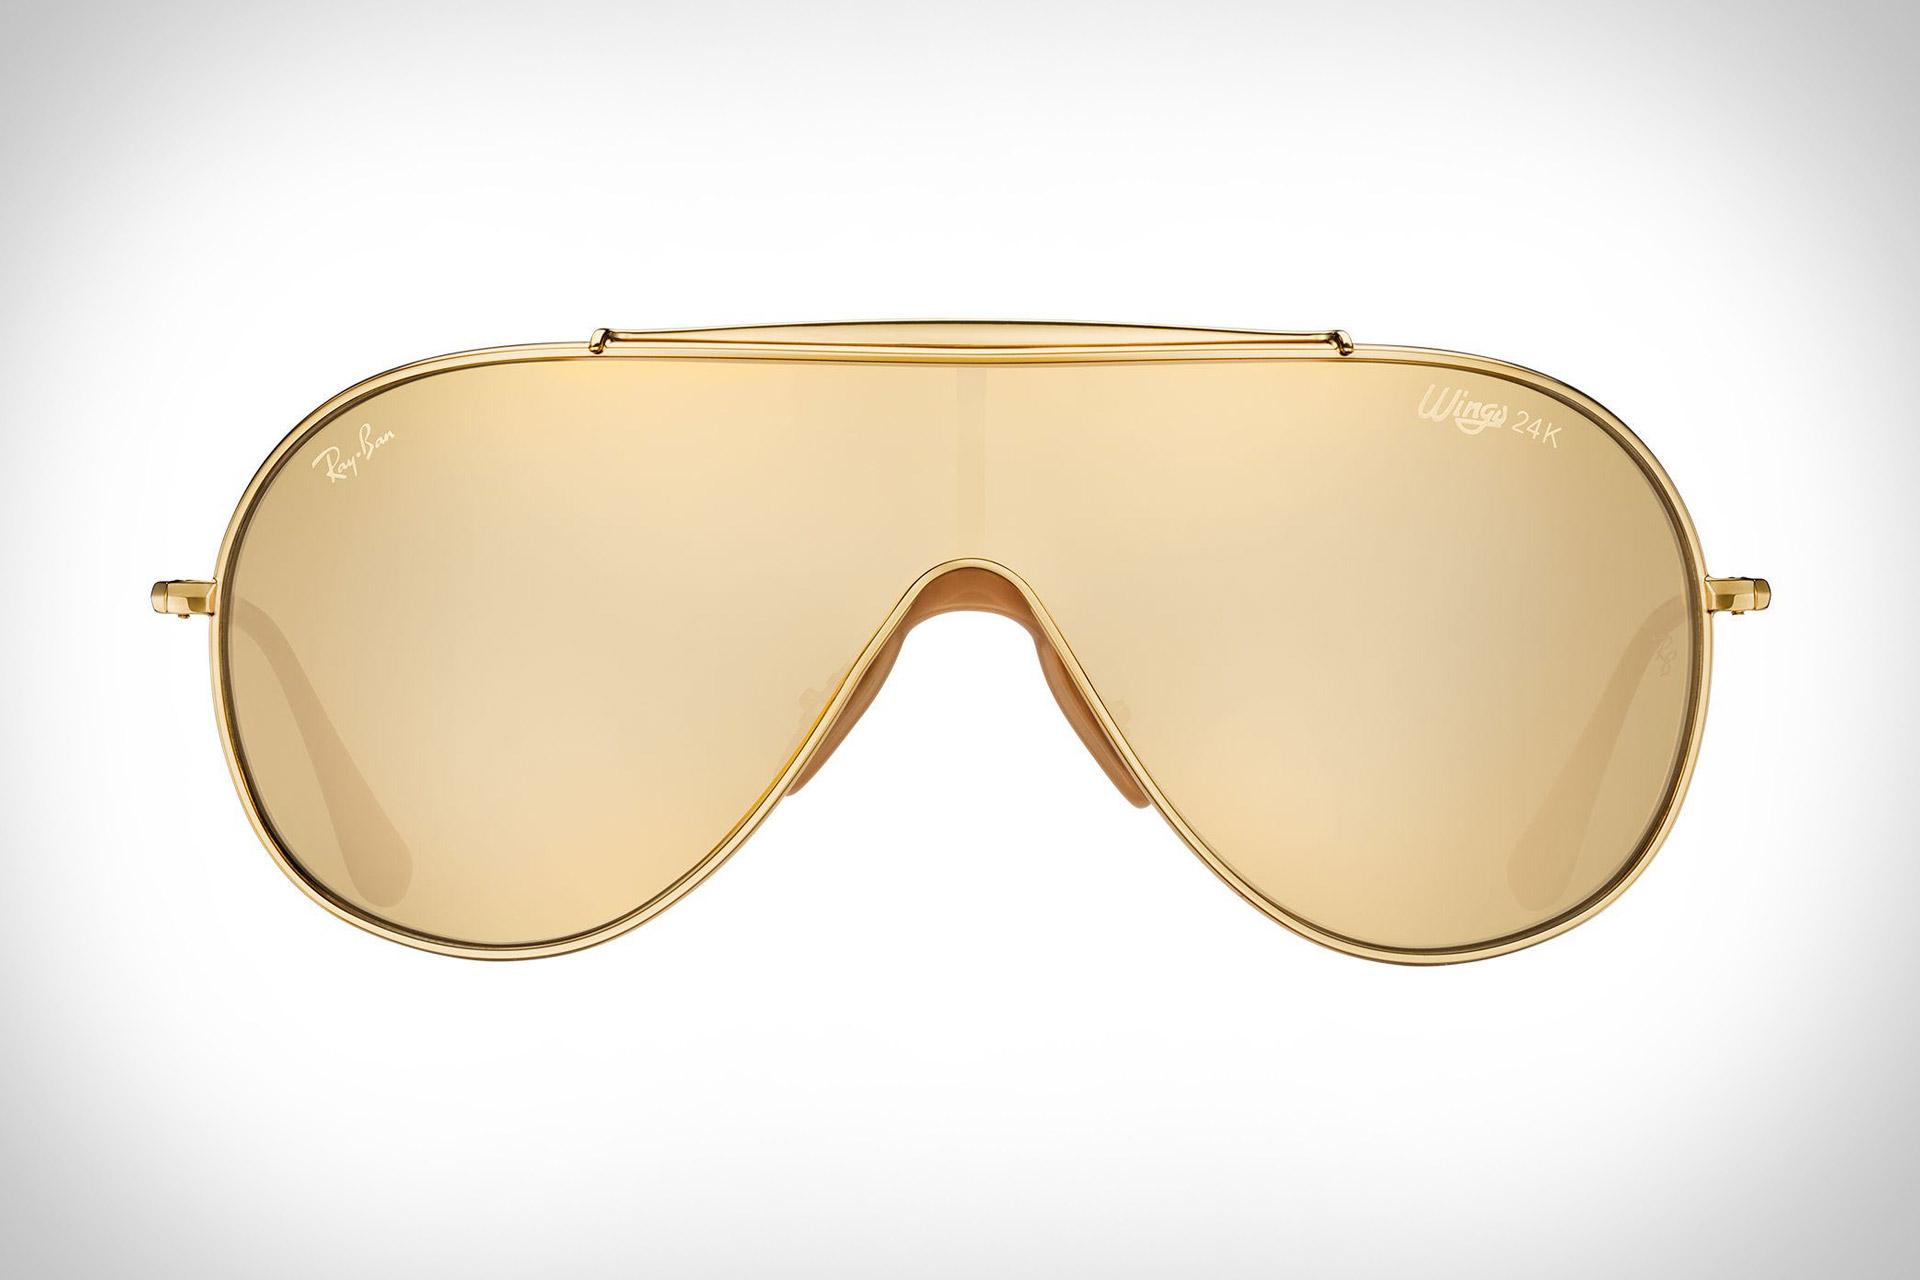 684fd411ed Gafas de Sol de 24K Ray-Ban Golden Wings | Uncrate